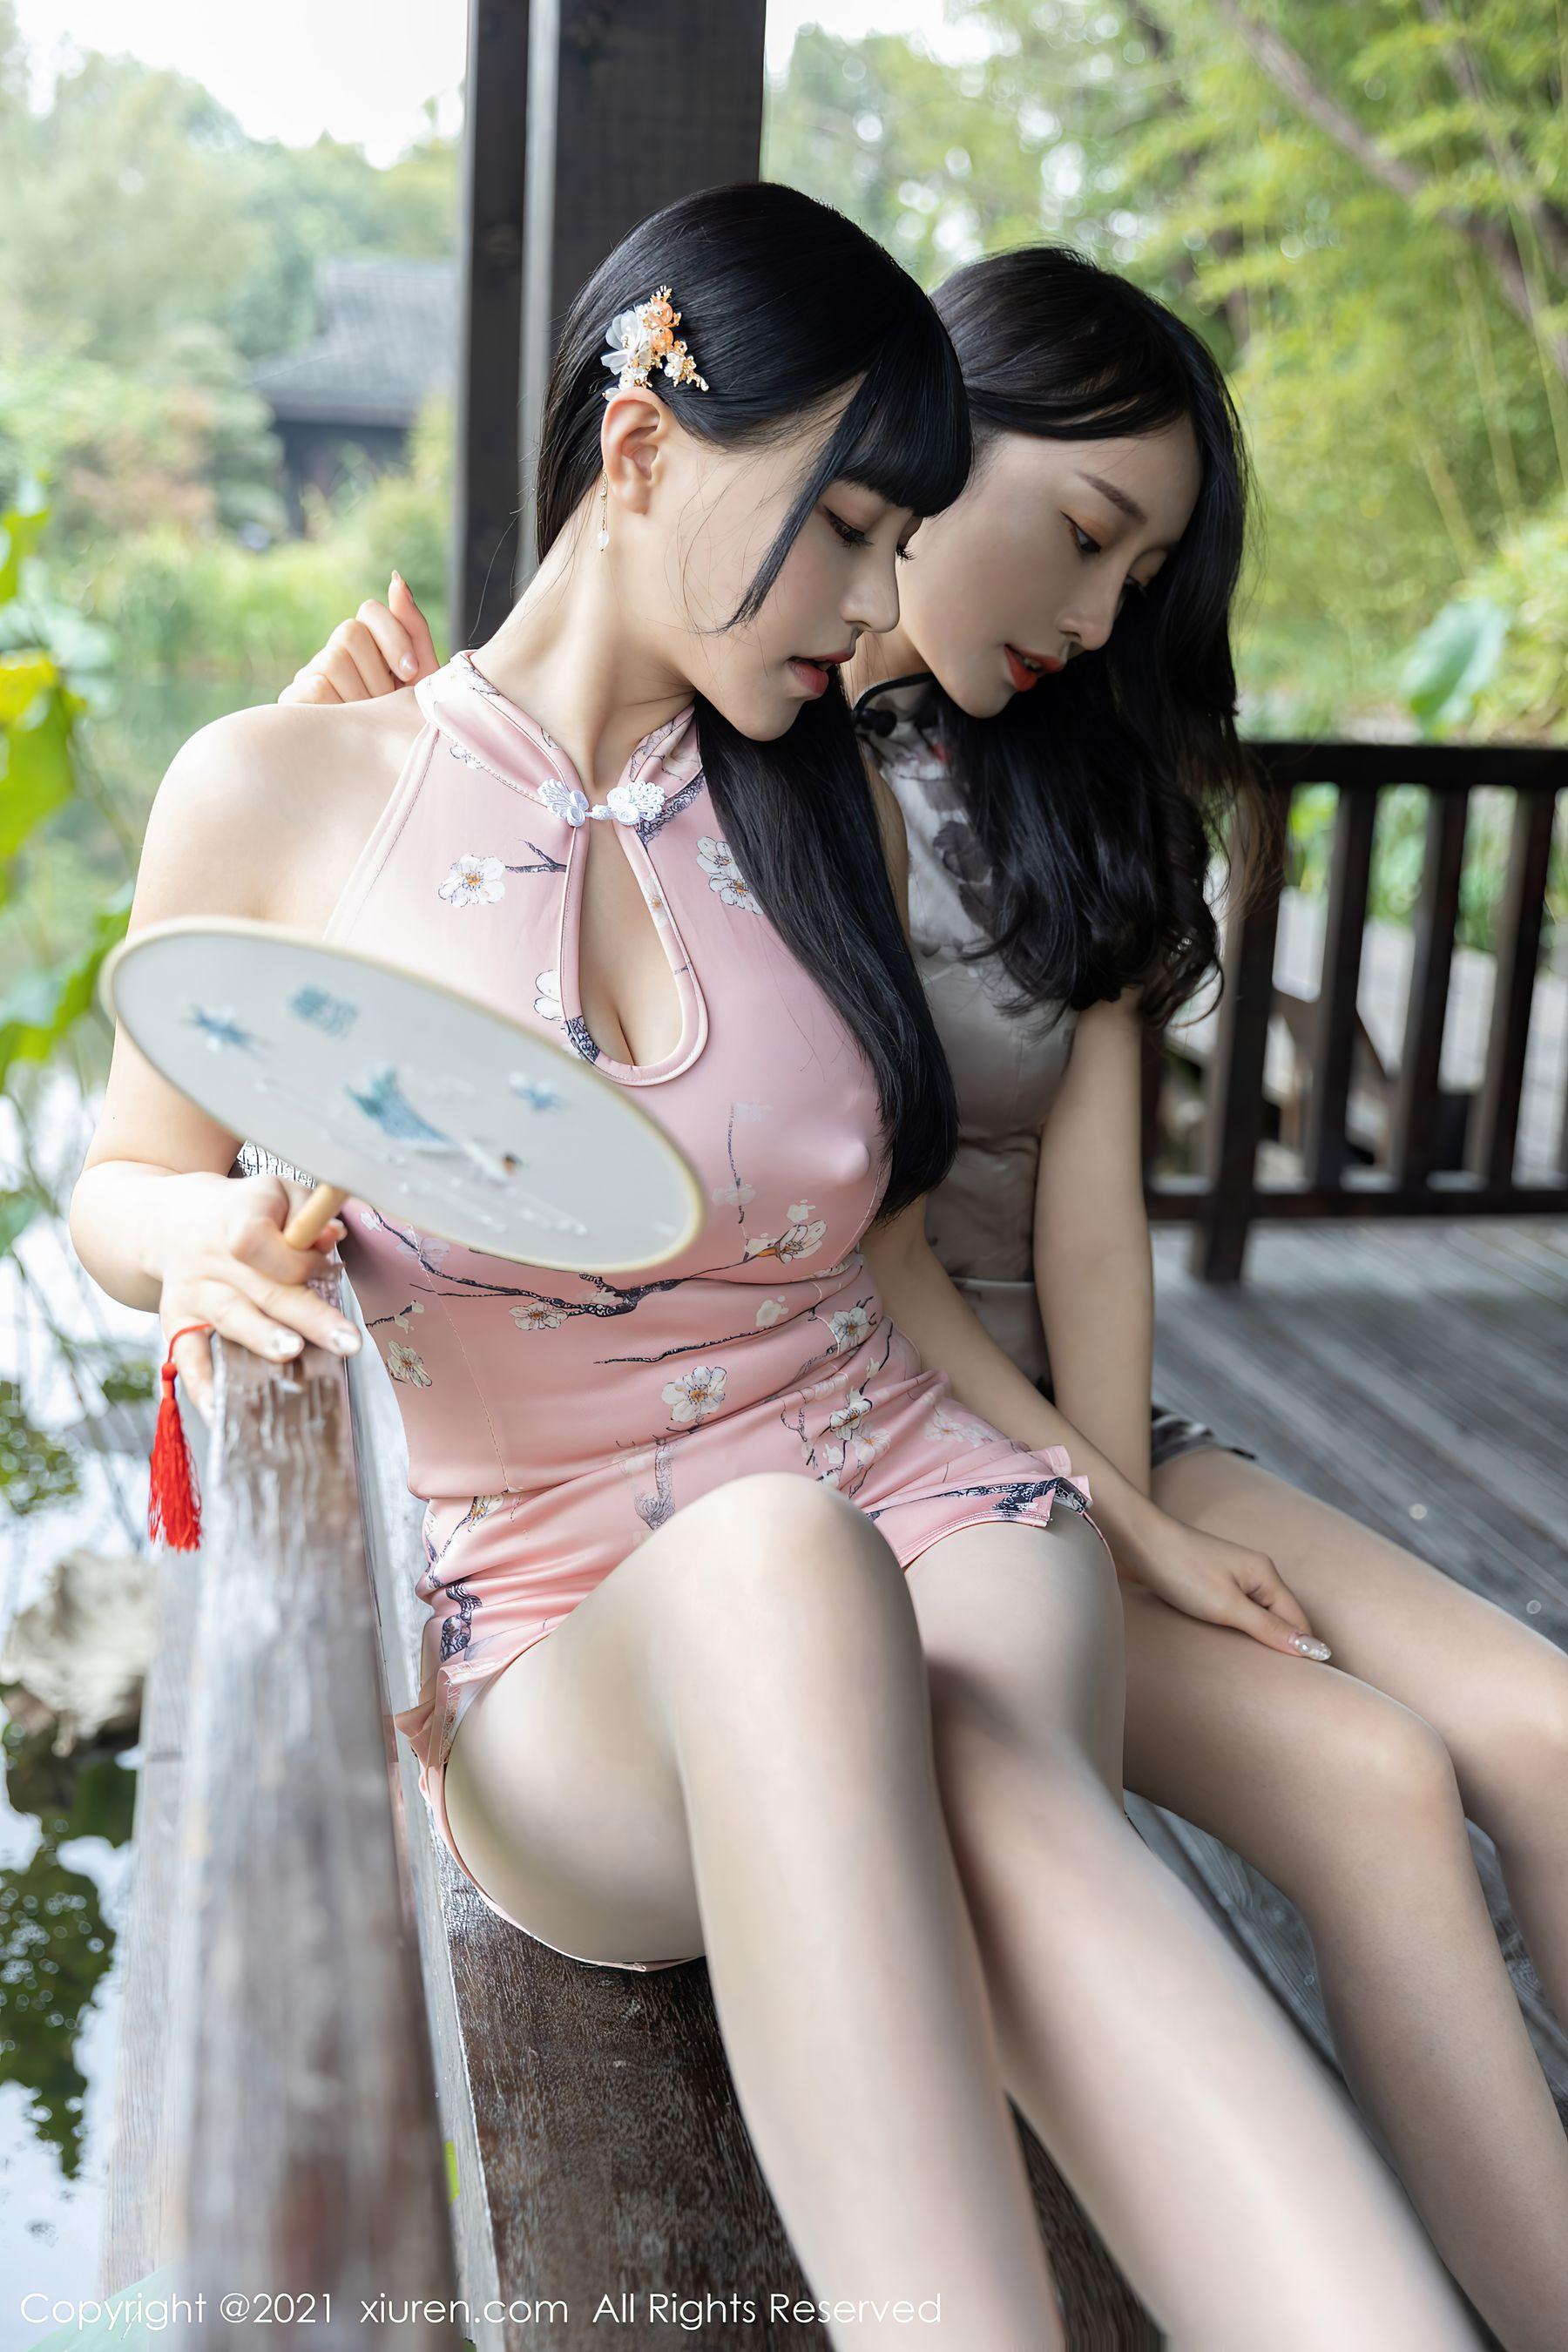 VOL.1001 [秀人网]美腿旗袍姐妹花:朱可儿超高清写真套图(63P)